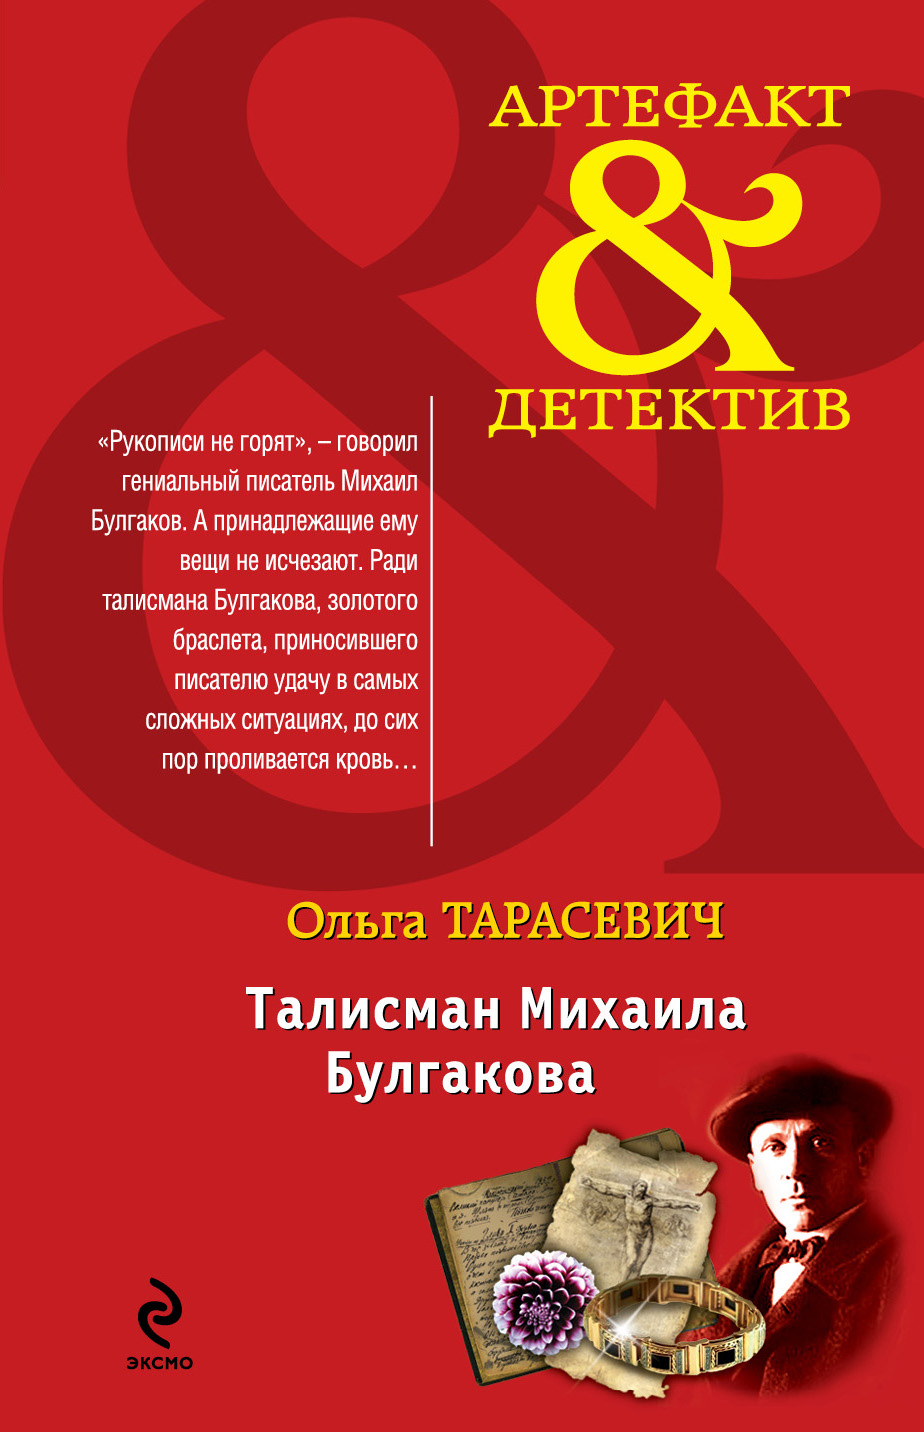 Талисман Михаила Булгакова